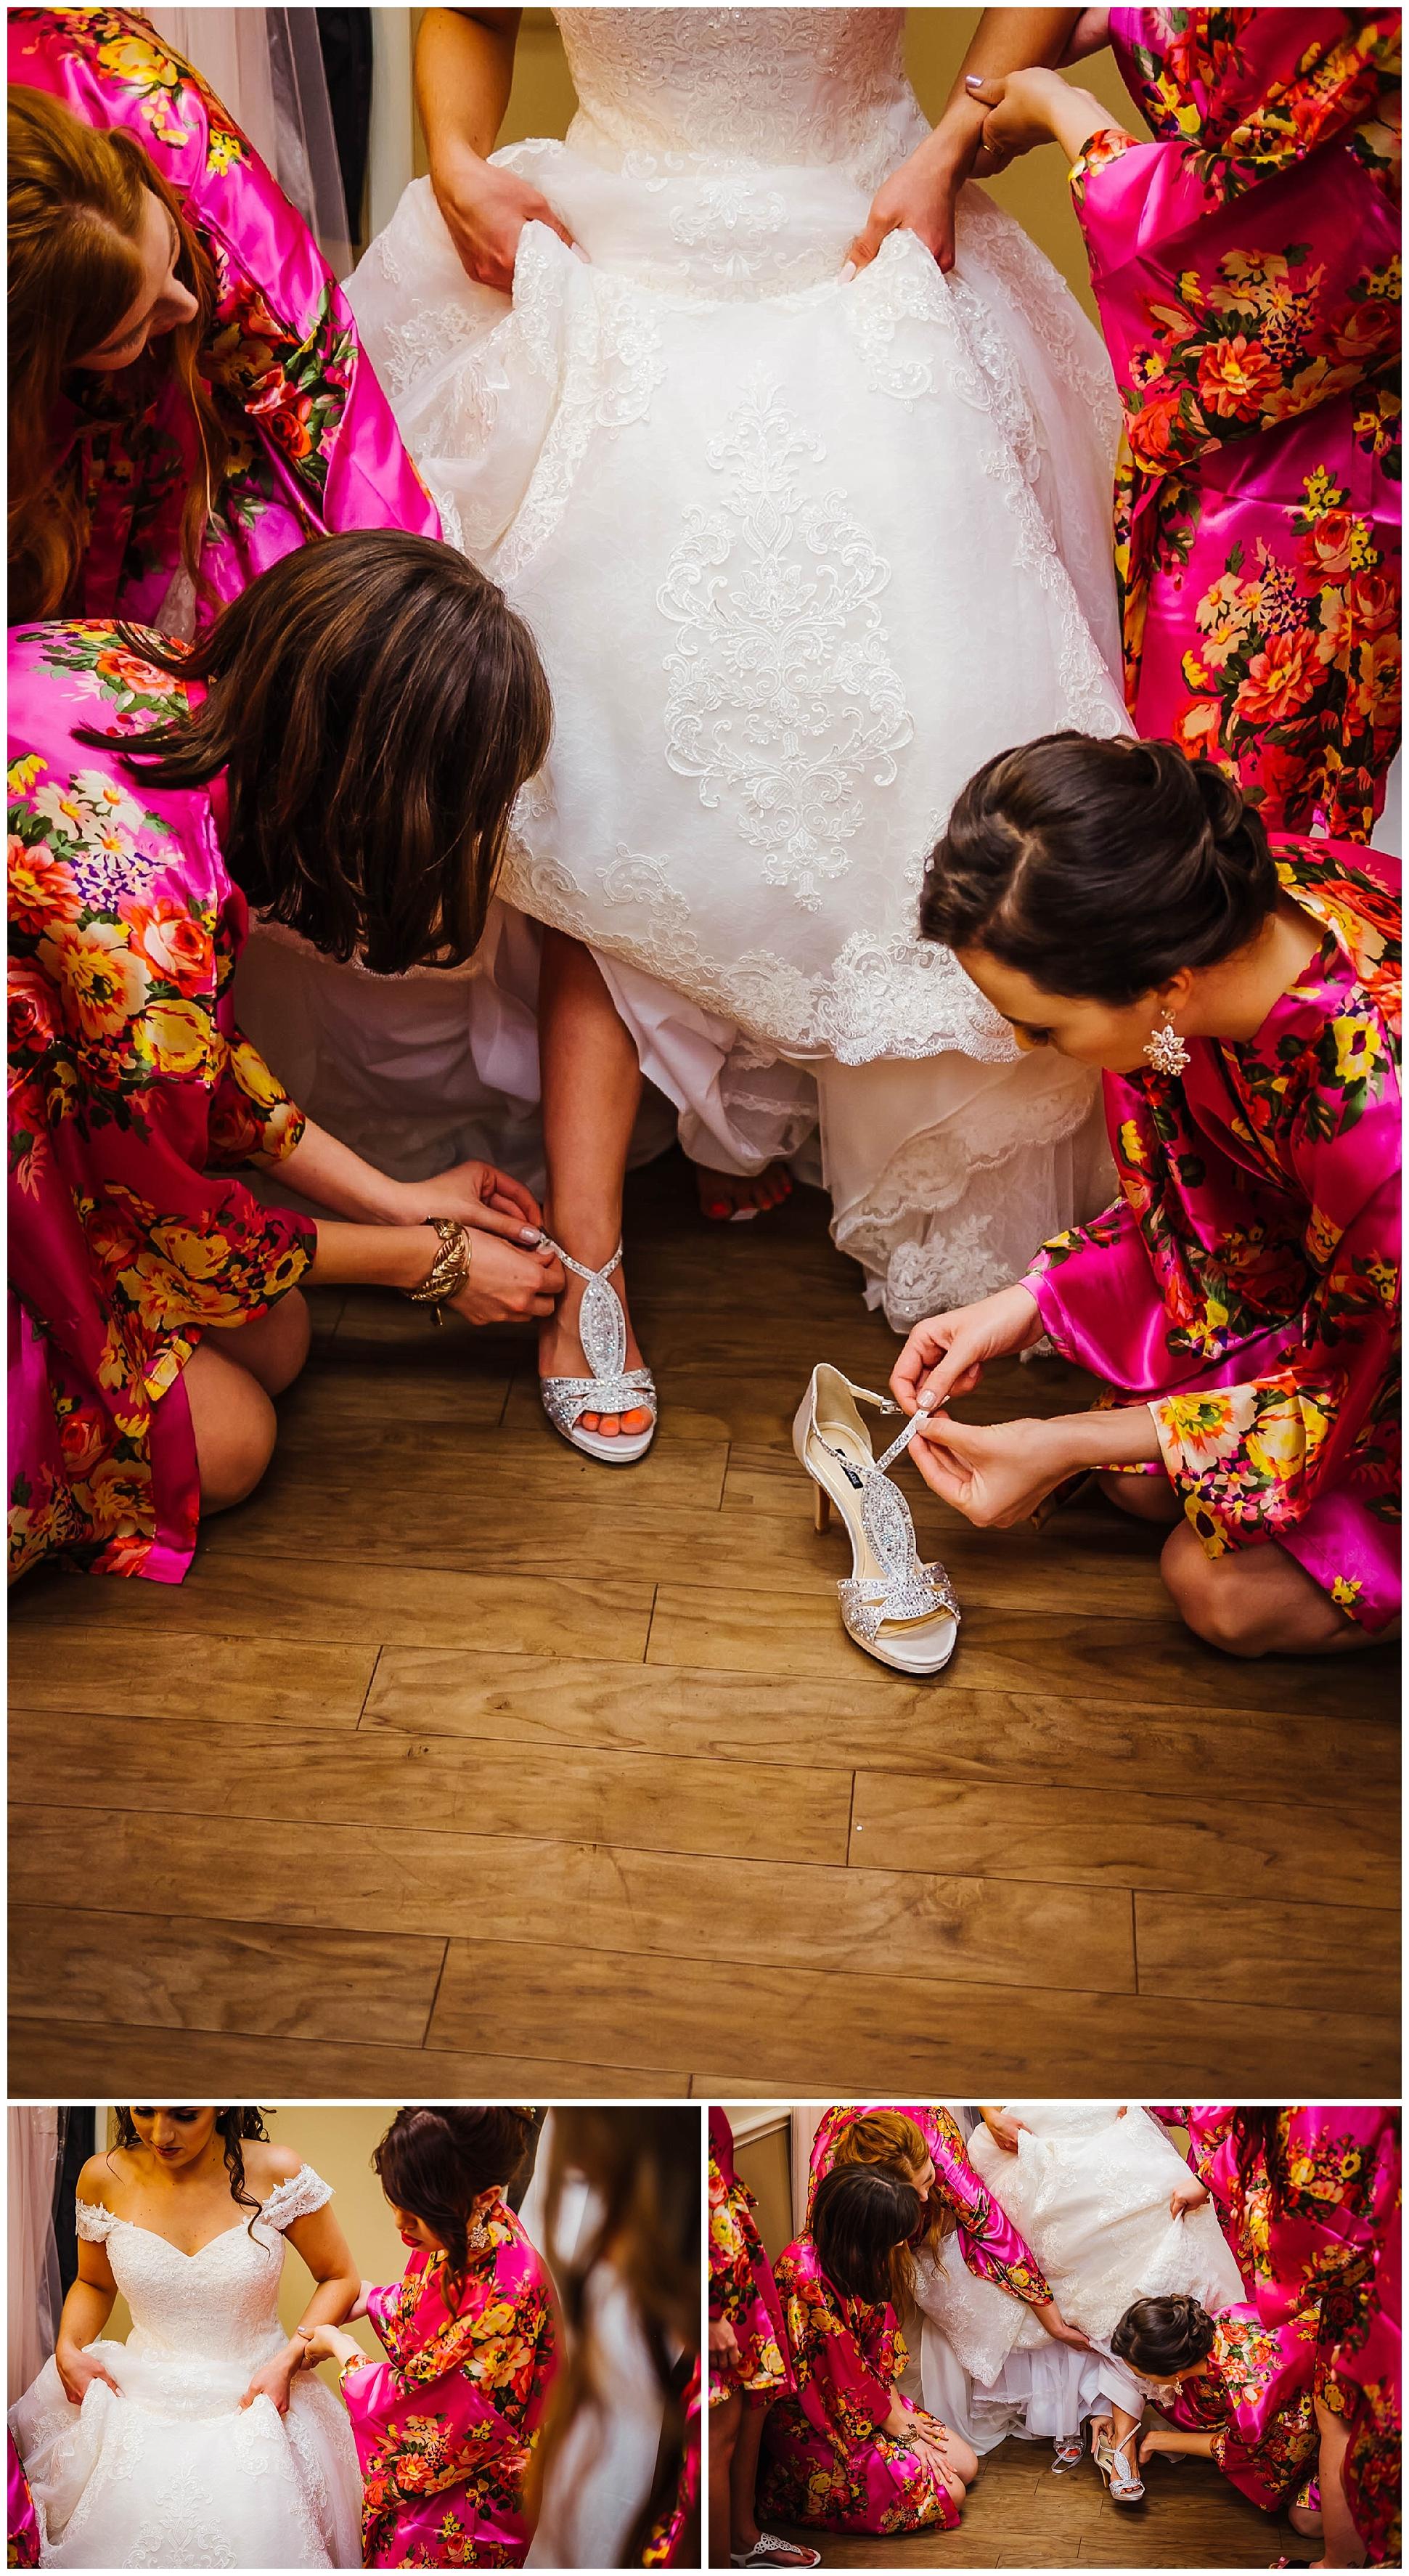 st-pete-wedding-photographer-sunken-gardens-crystal-ballroom-princess-dancer_0127.jpg